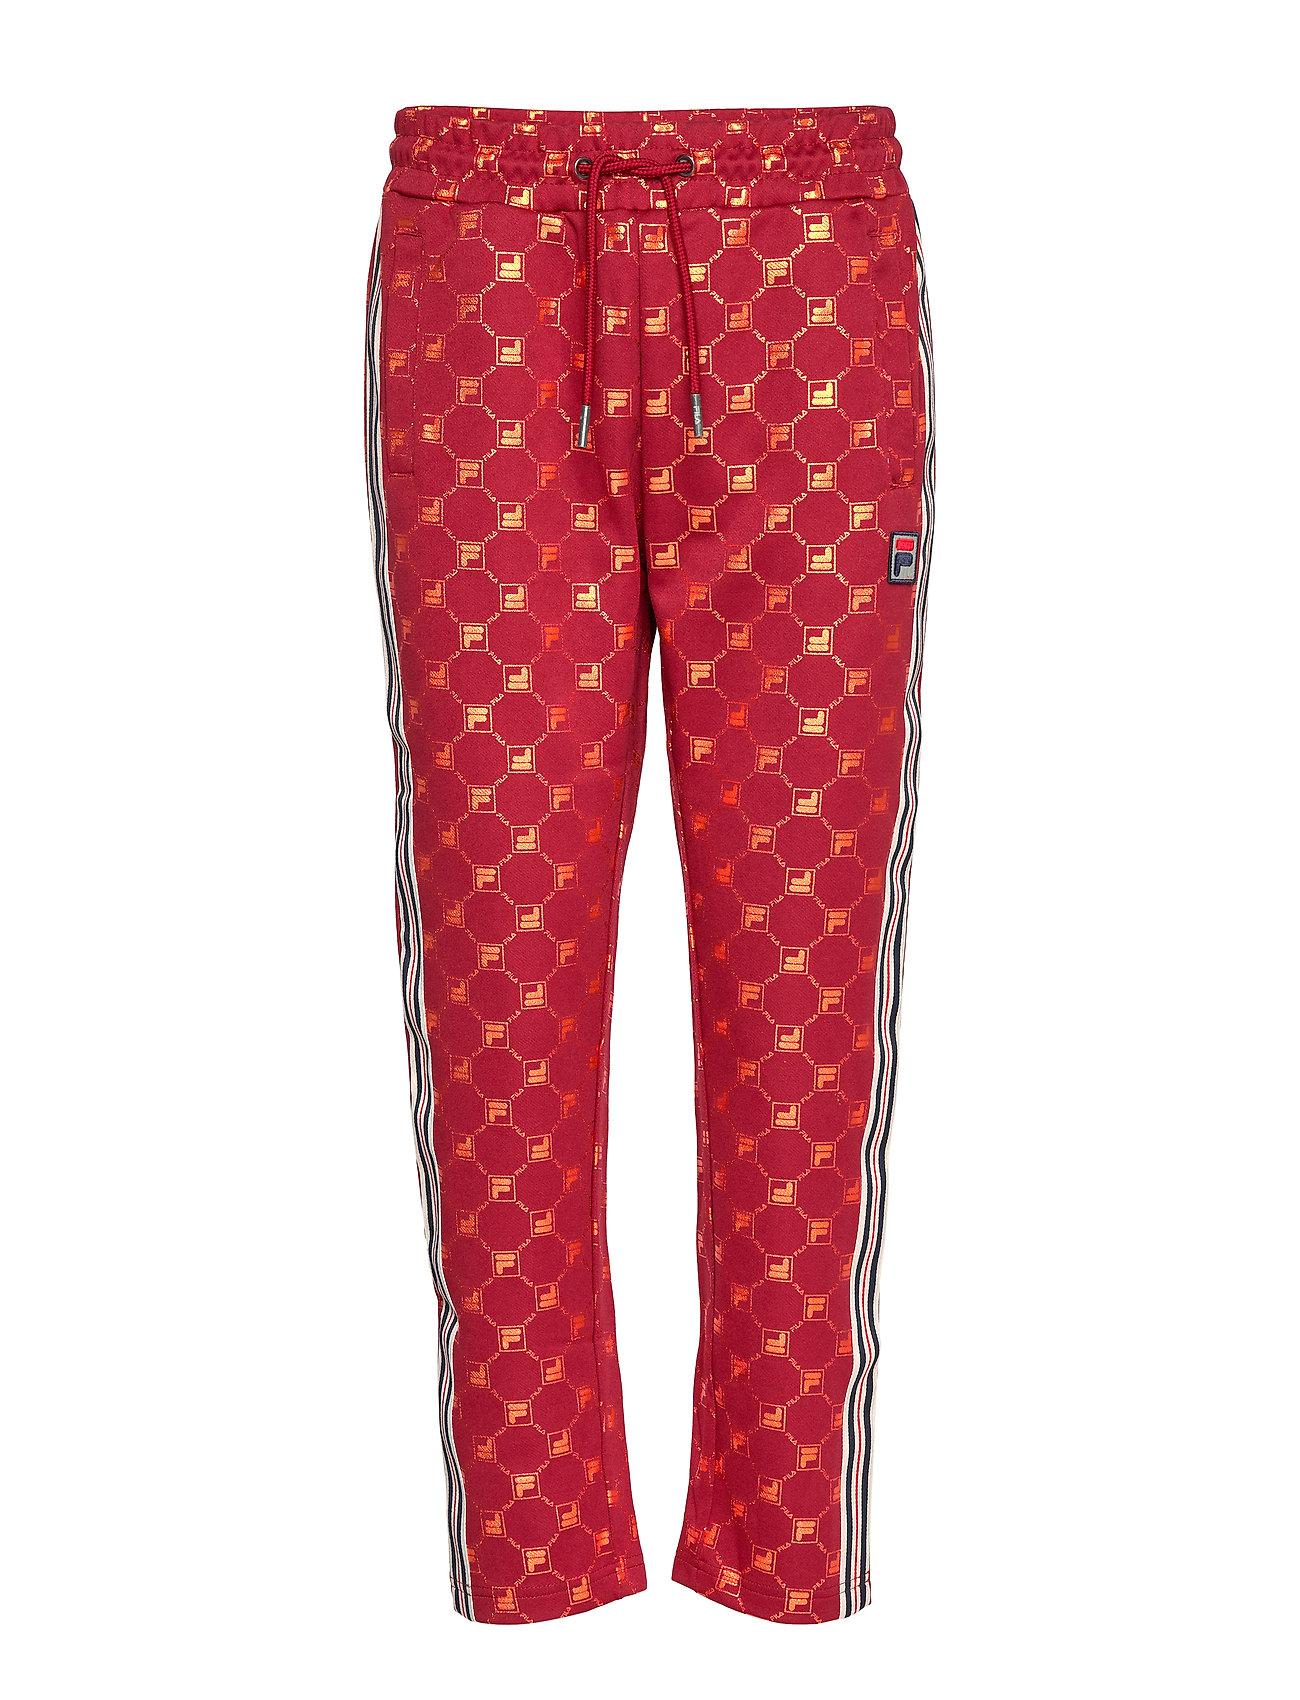 FILA WOMEN GVANTSA AOP cropped pants - A259 - RHUBARB-MANDARIN ORANGE ALLOVER